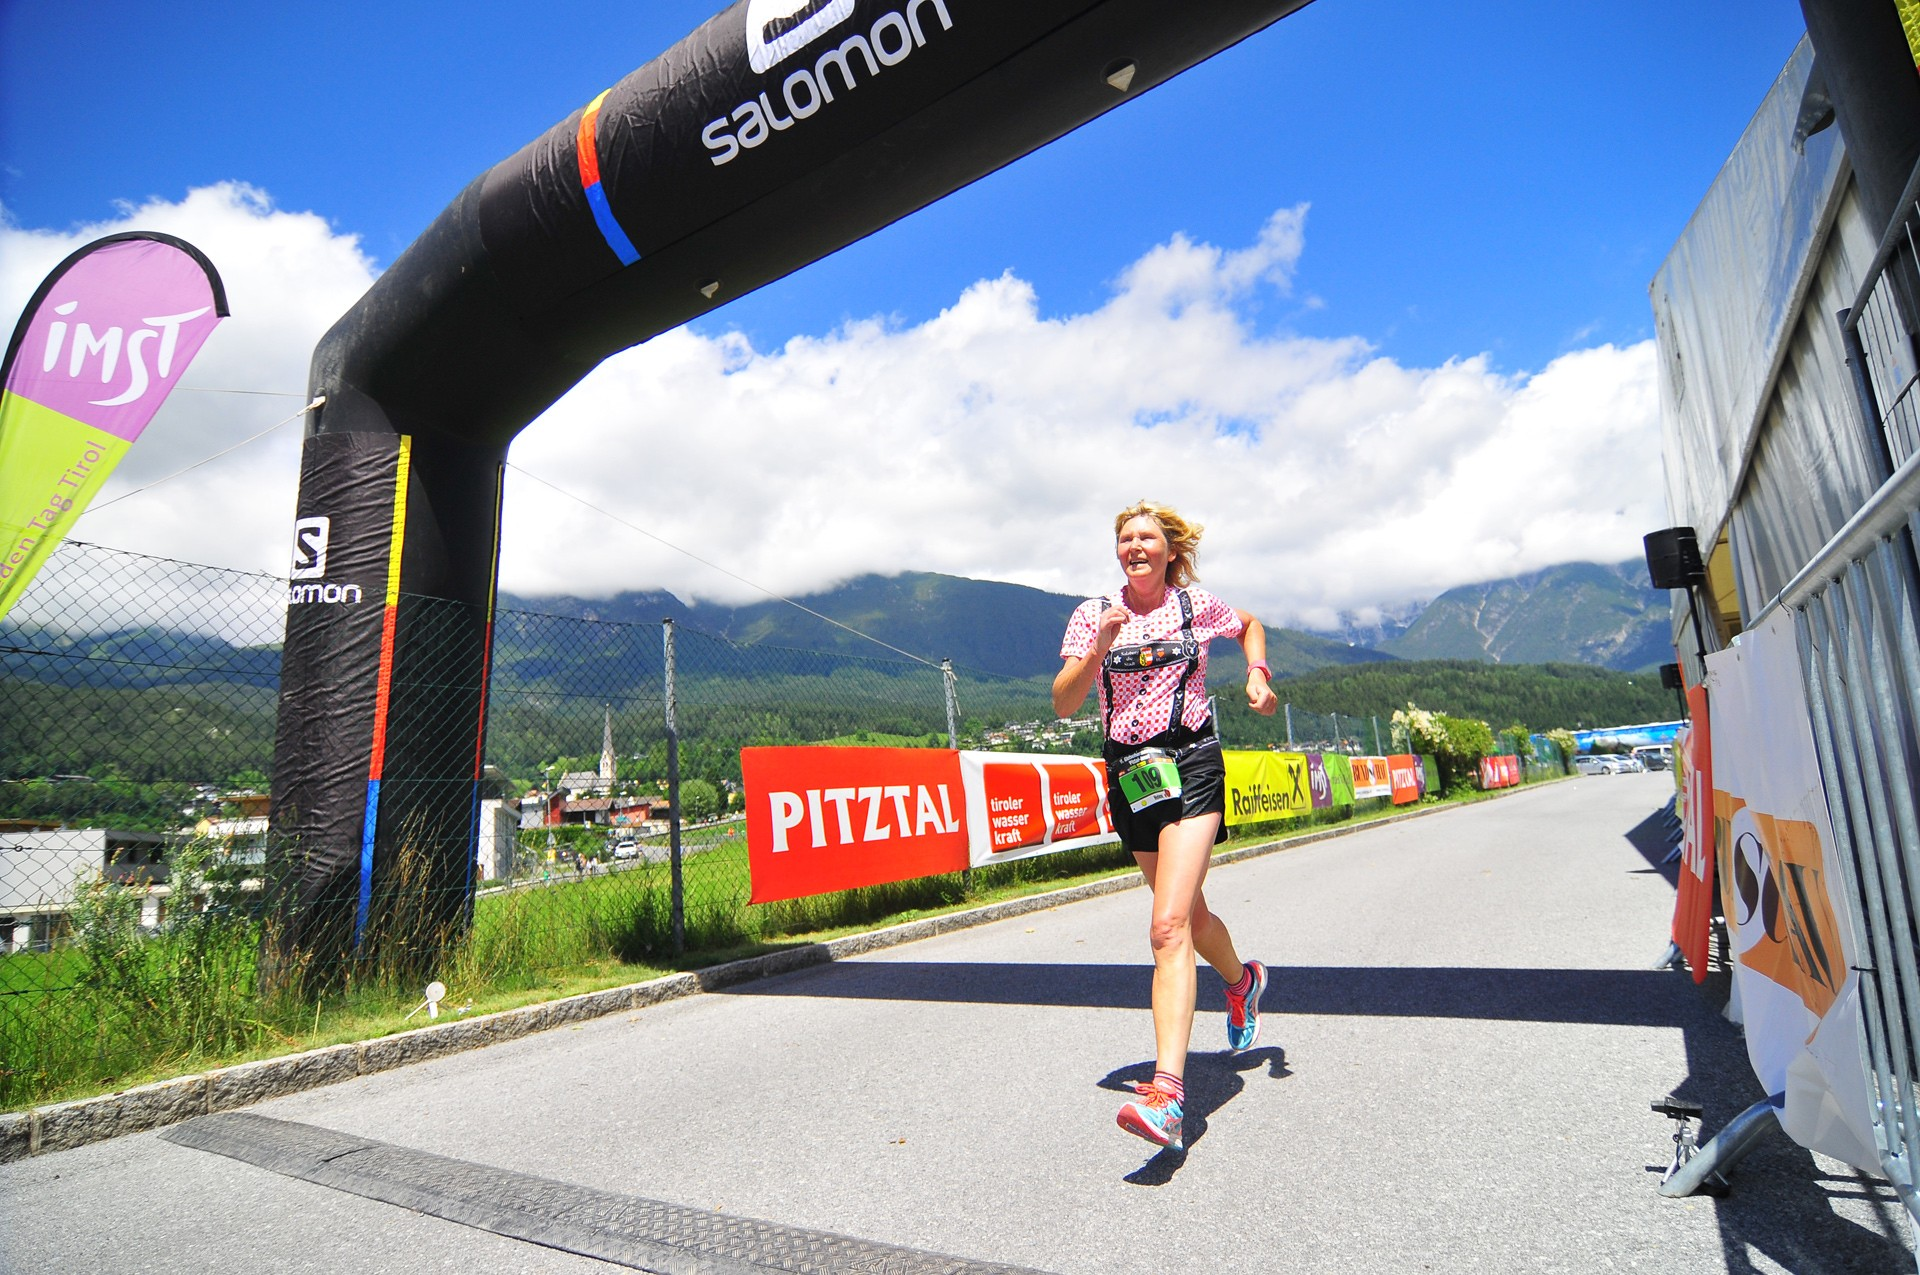 Glacier marathon finish area